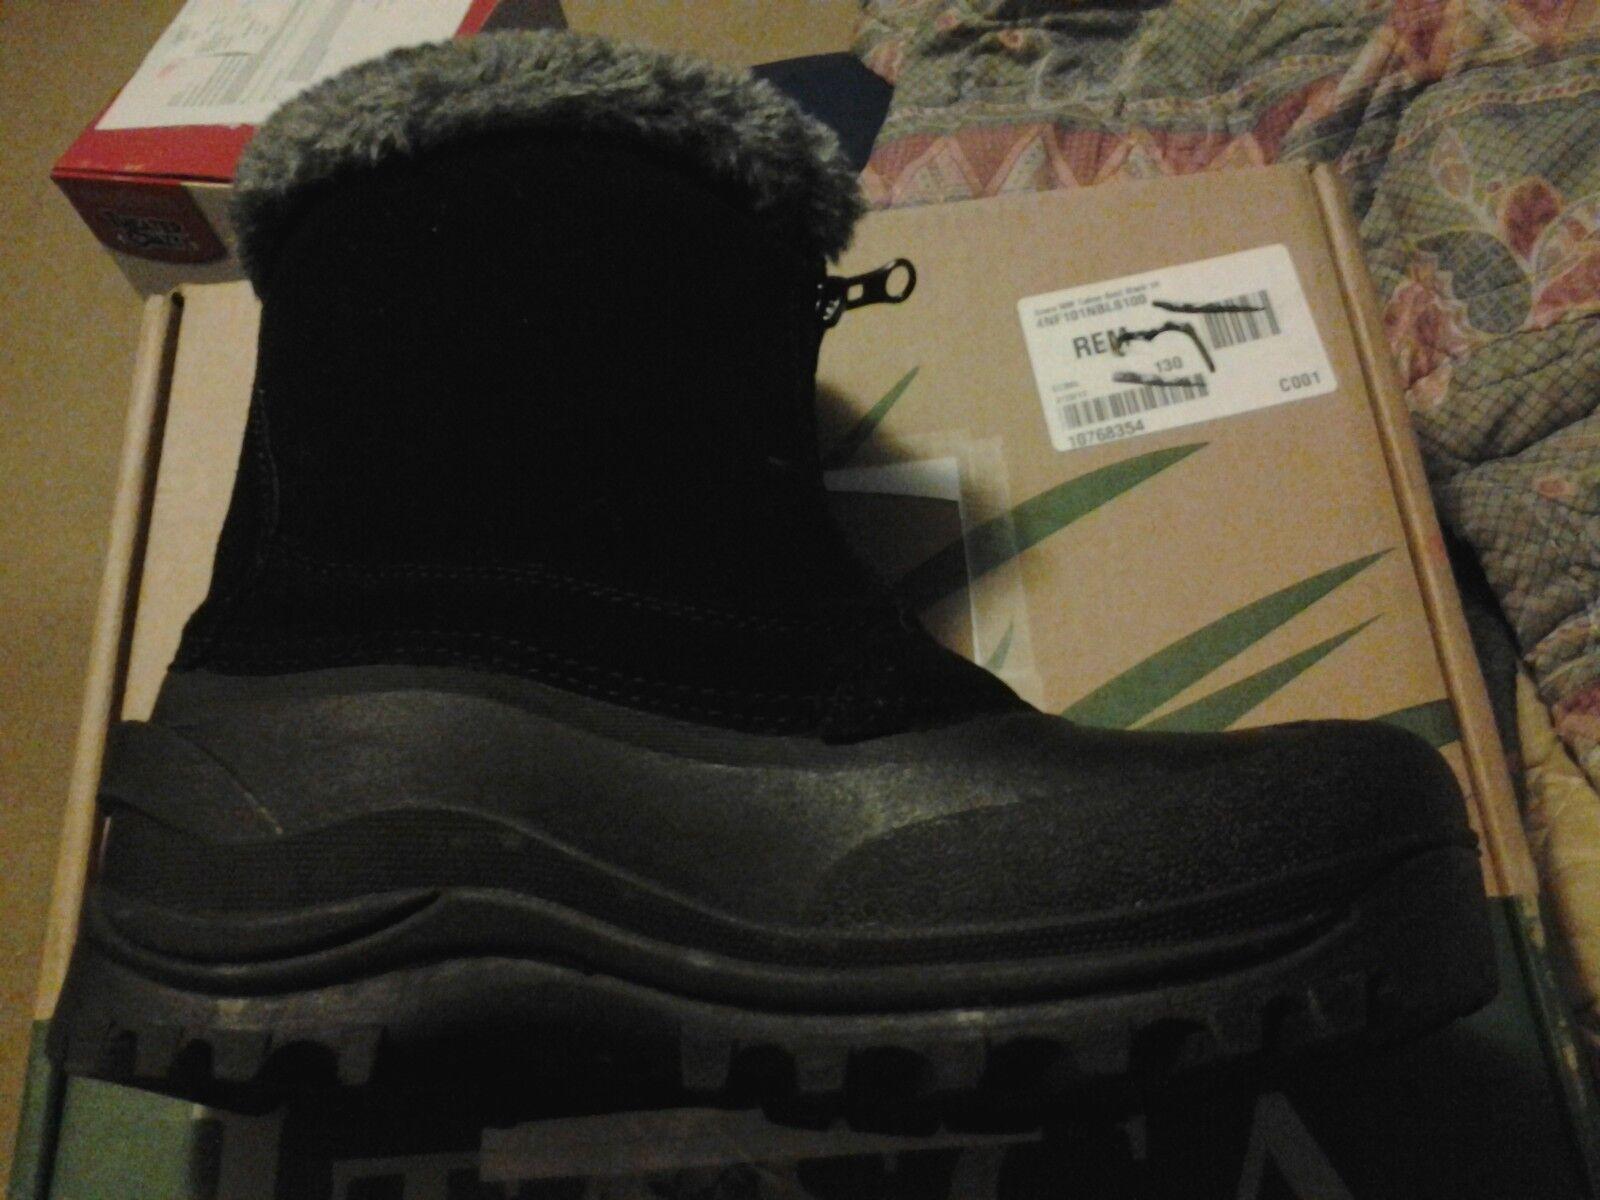 Itasca Tahoe Waterproof Winter Boots - Black - Women's 10